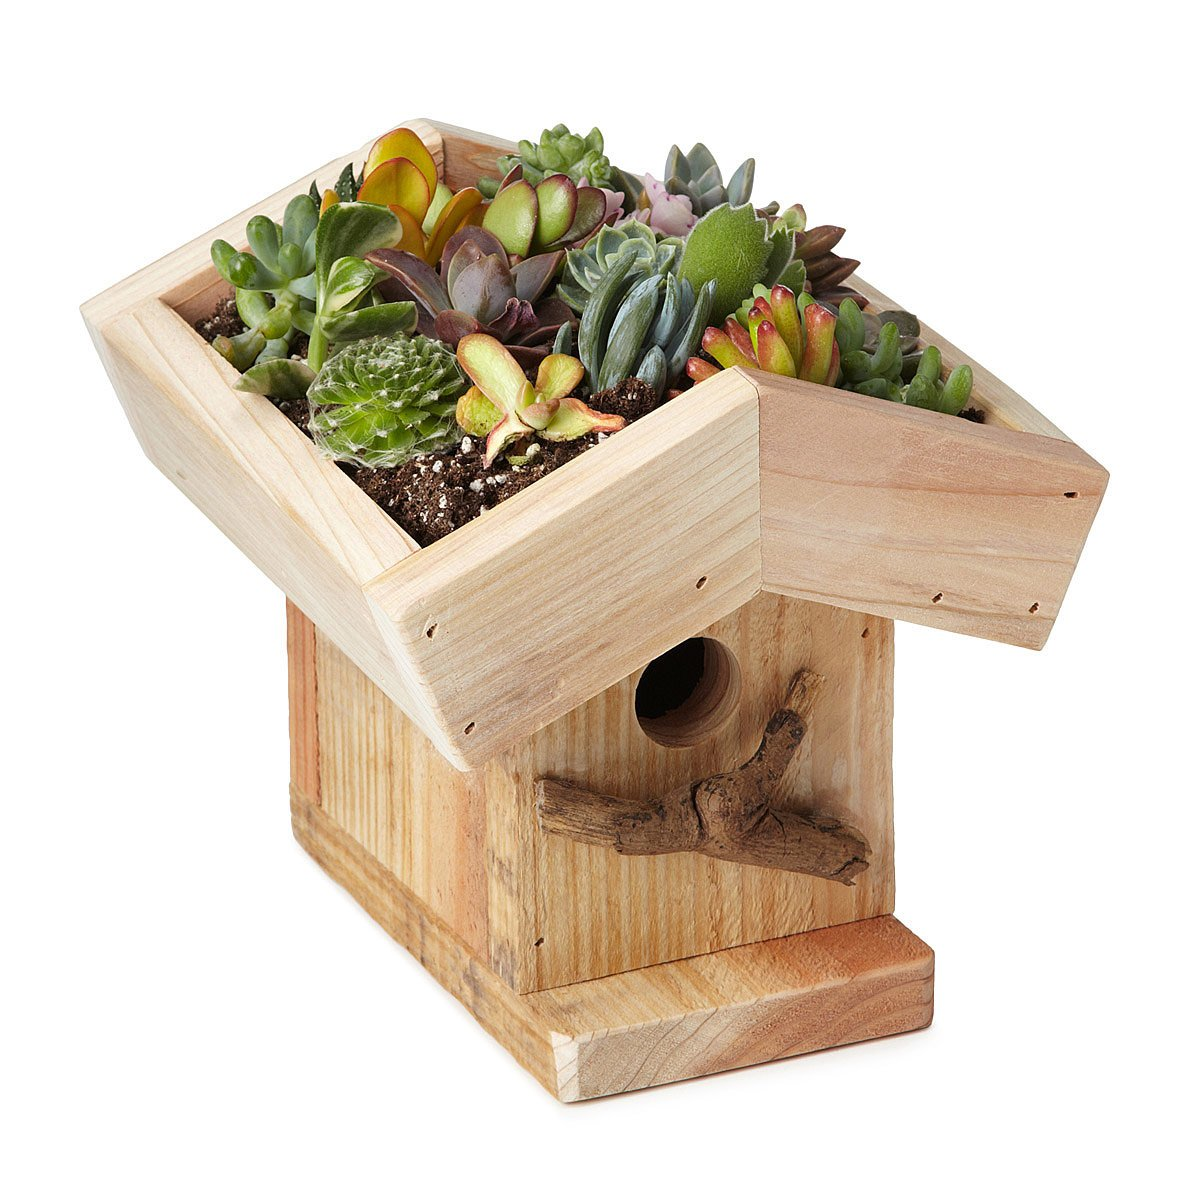 Construcción de casas de aves